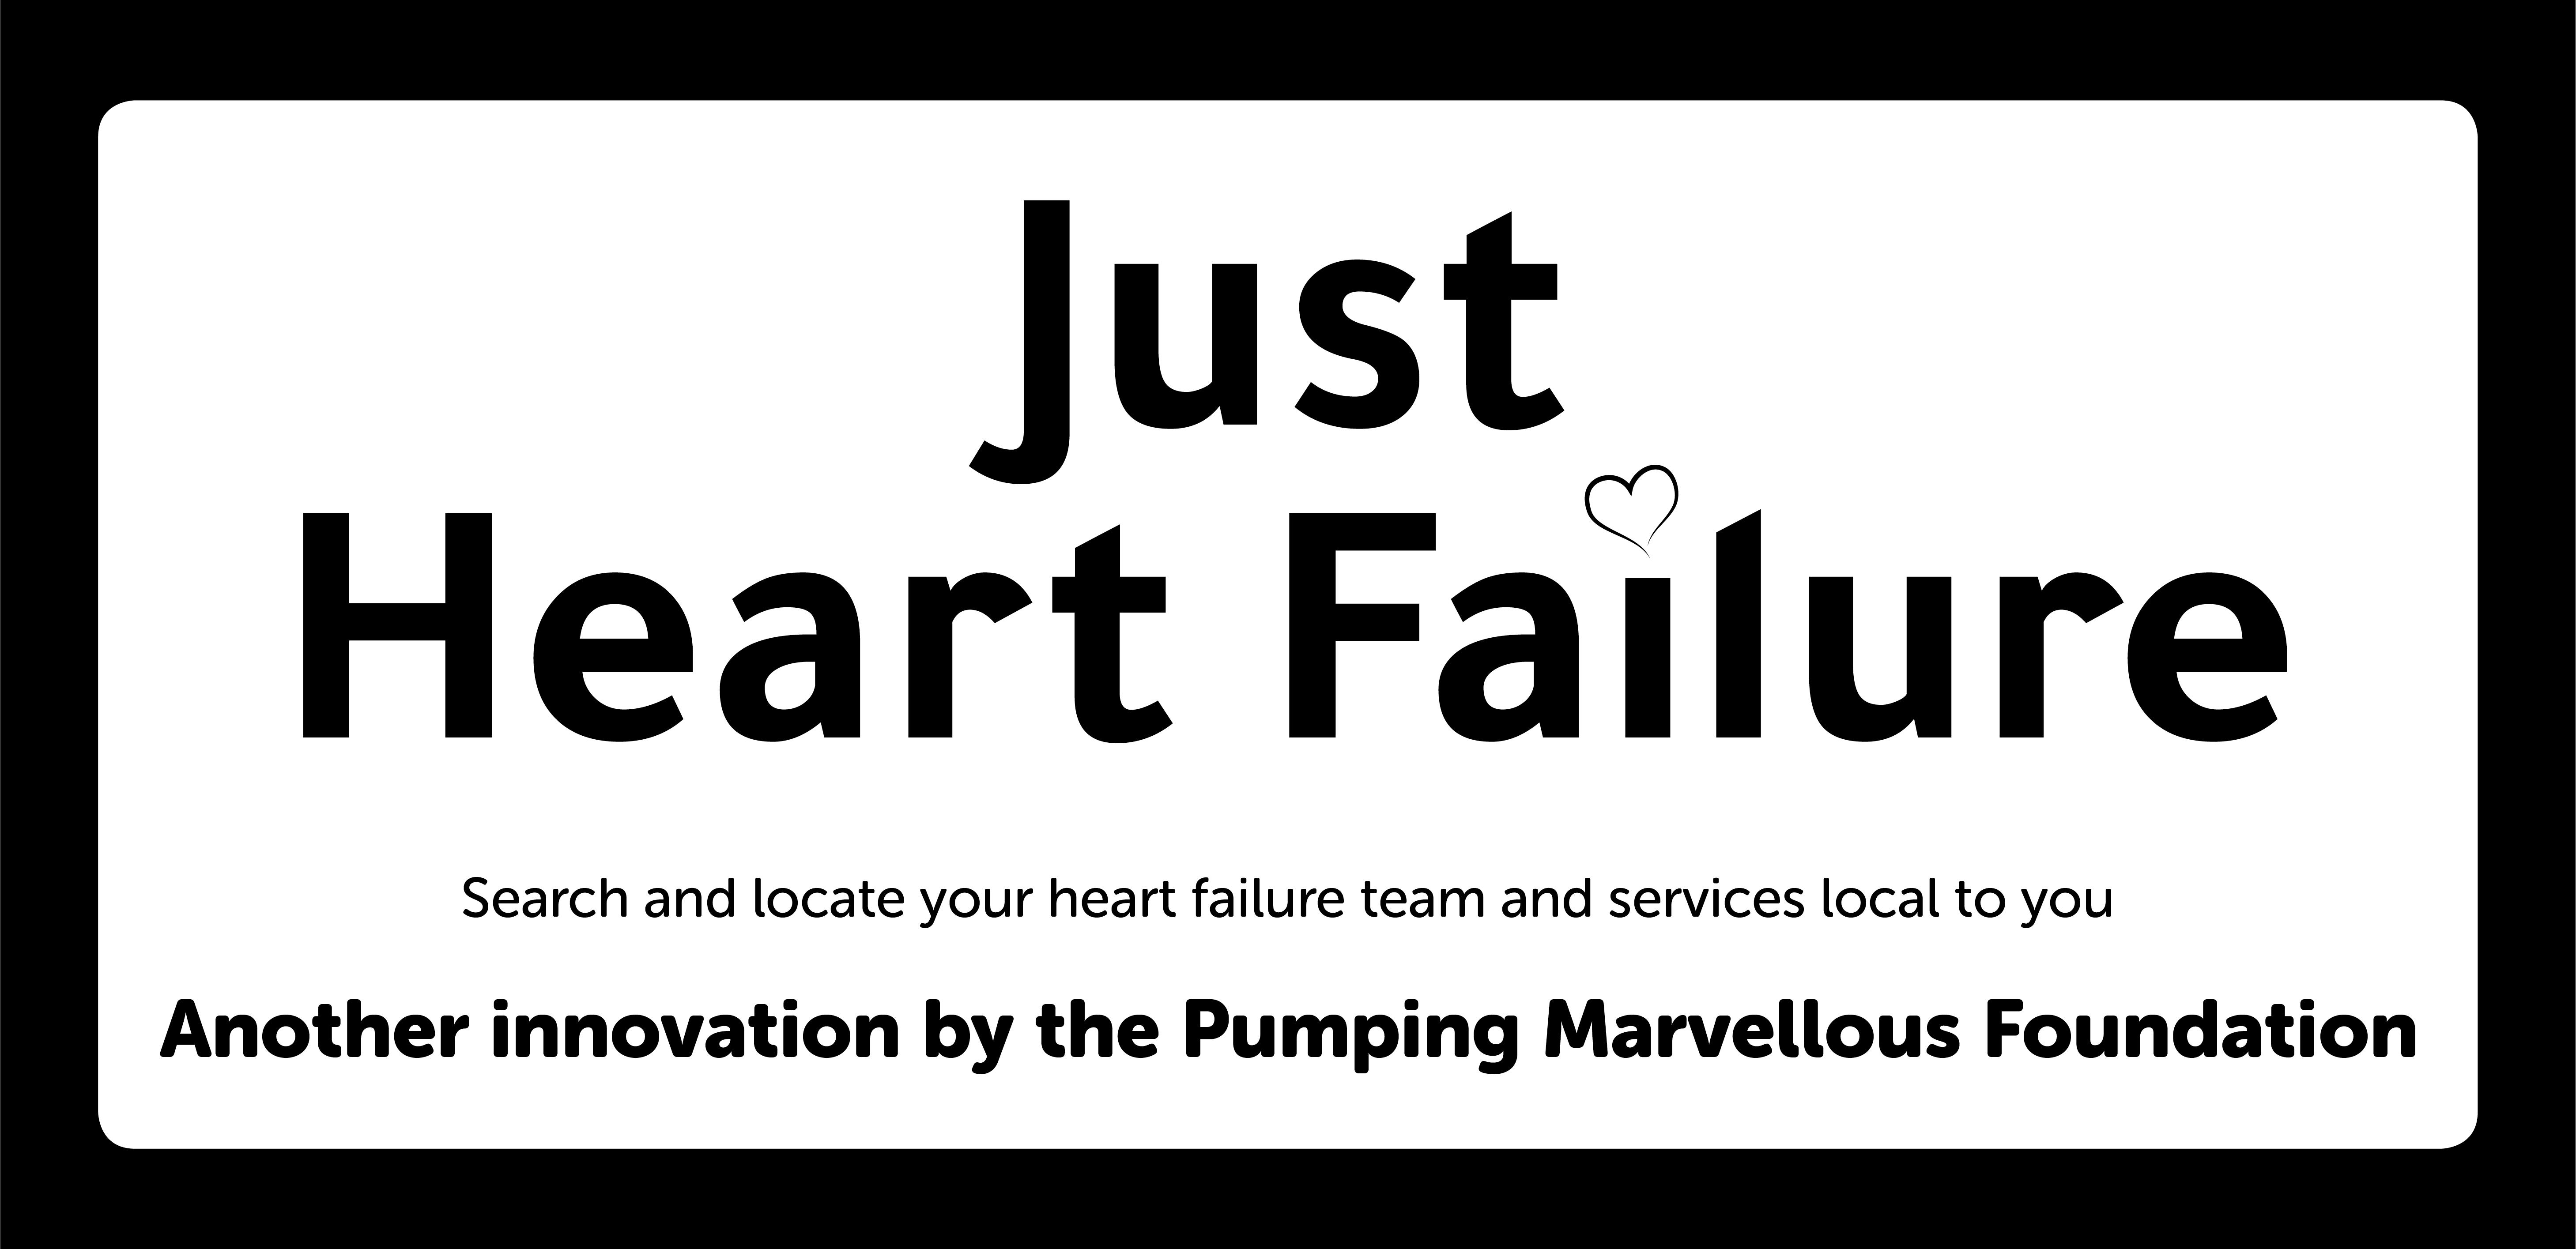 Just Heart Failure